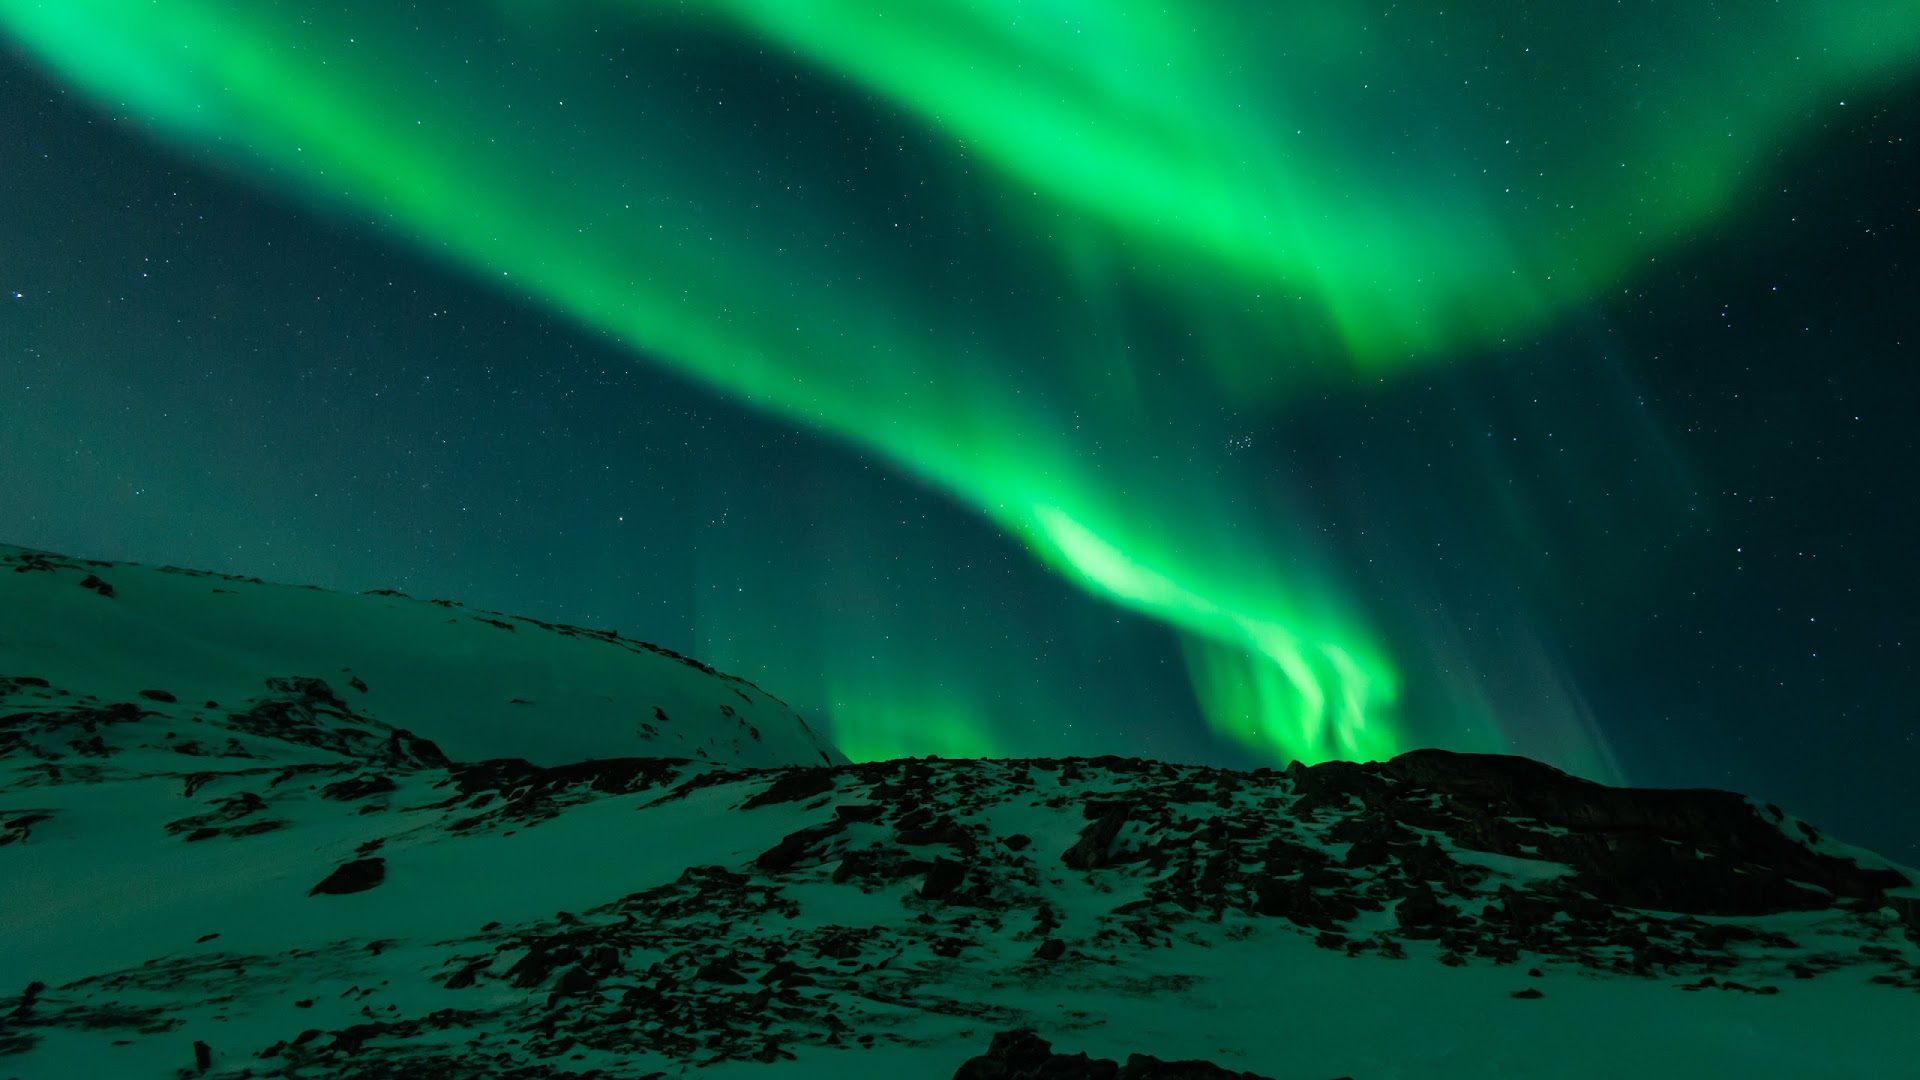 Aurora borealis iphone wallpaper wallpapersafari for Sfondi aurora boreale